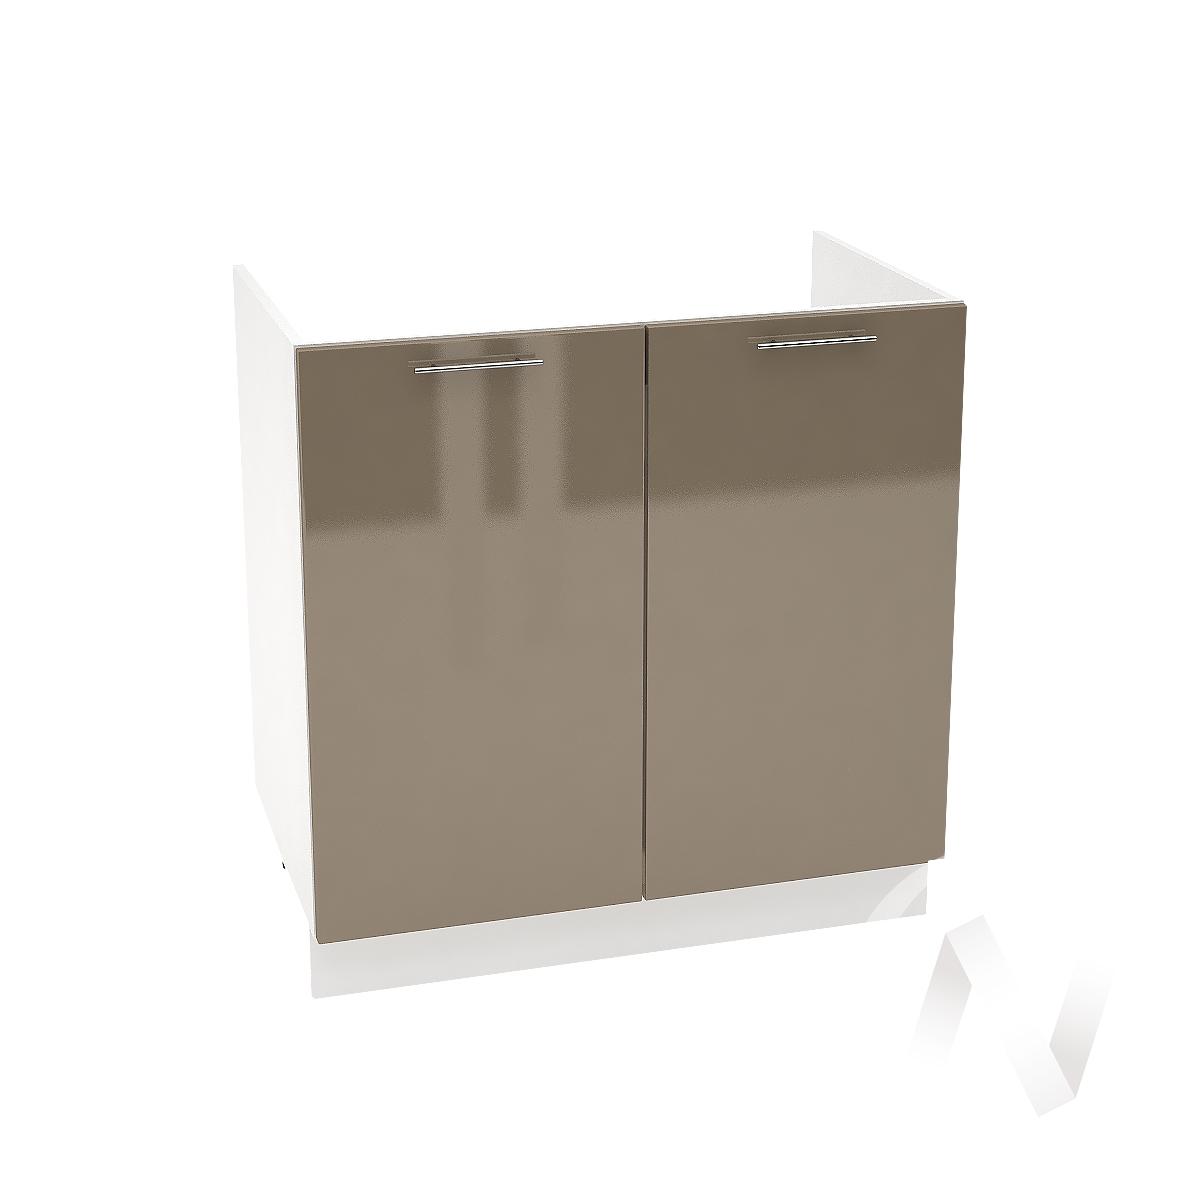 "Кухня ""Валерия-М"": Шкаф нижний под мойку 800, ШНМ 800 (Капучино глянец/корпус белый)"